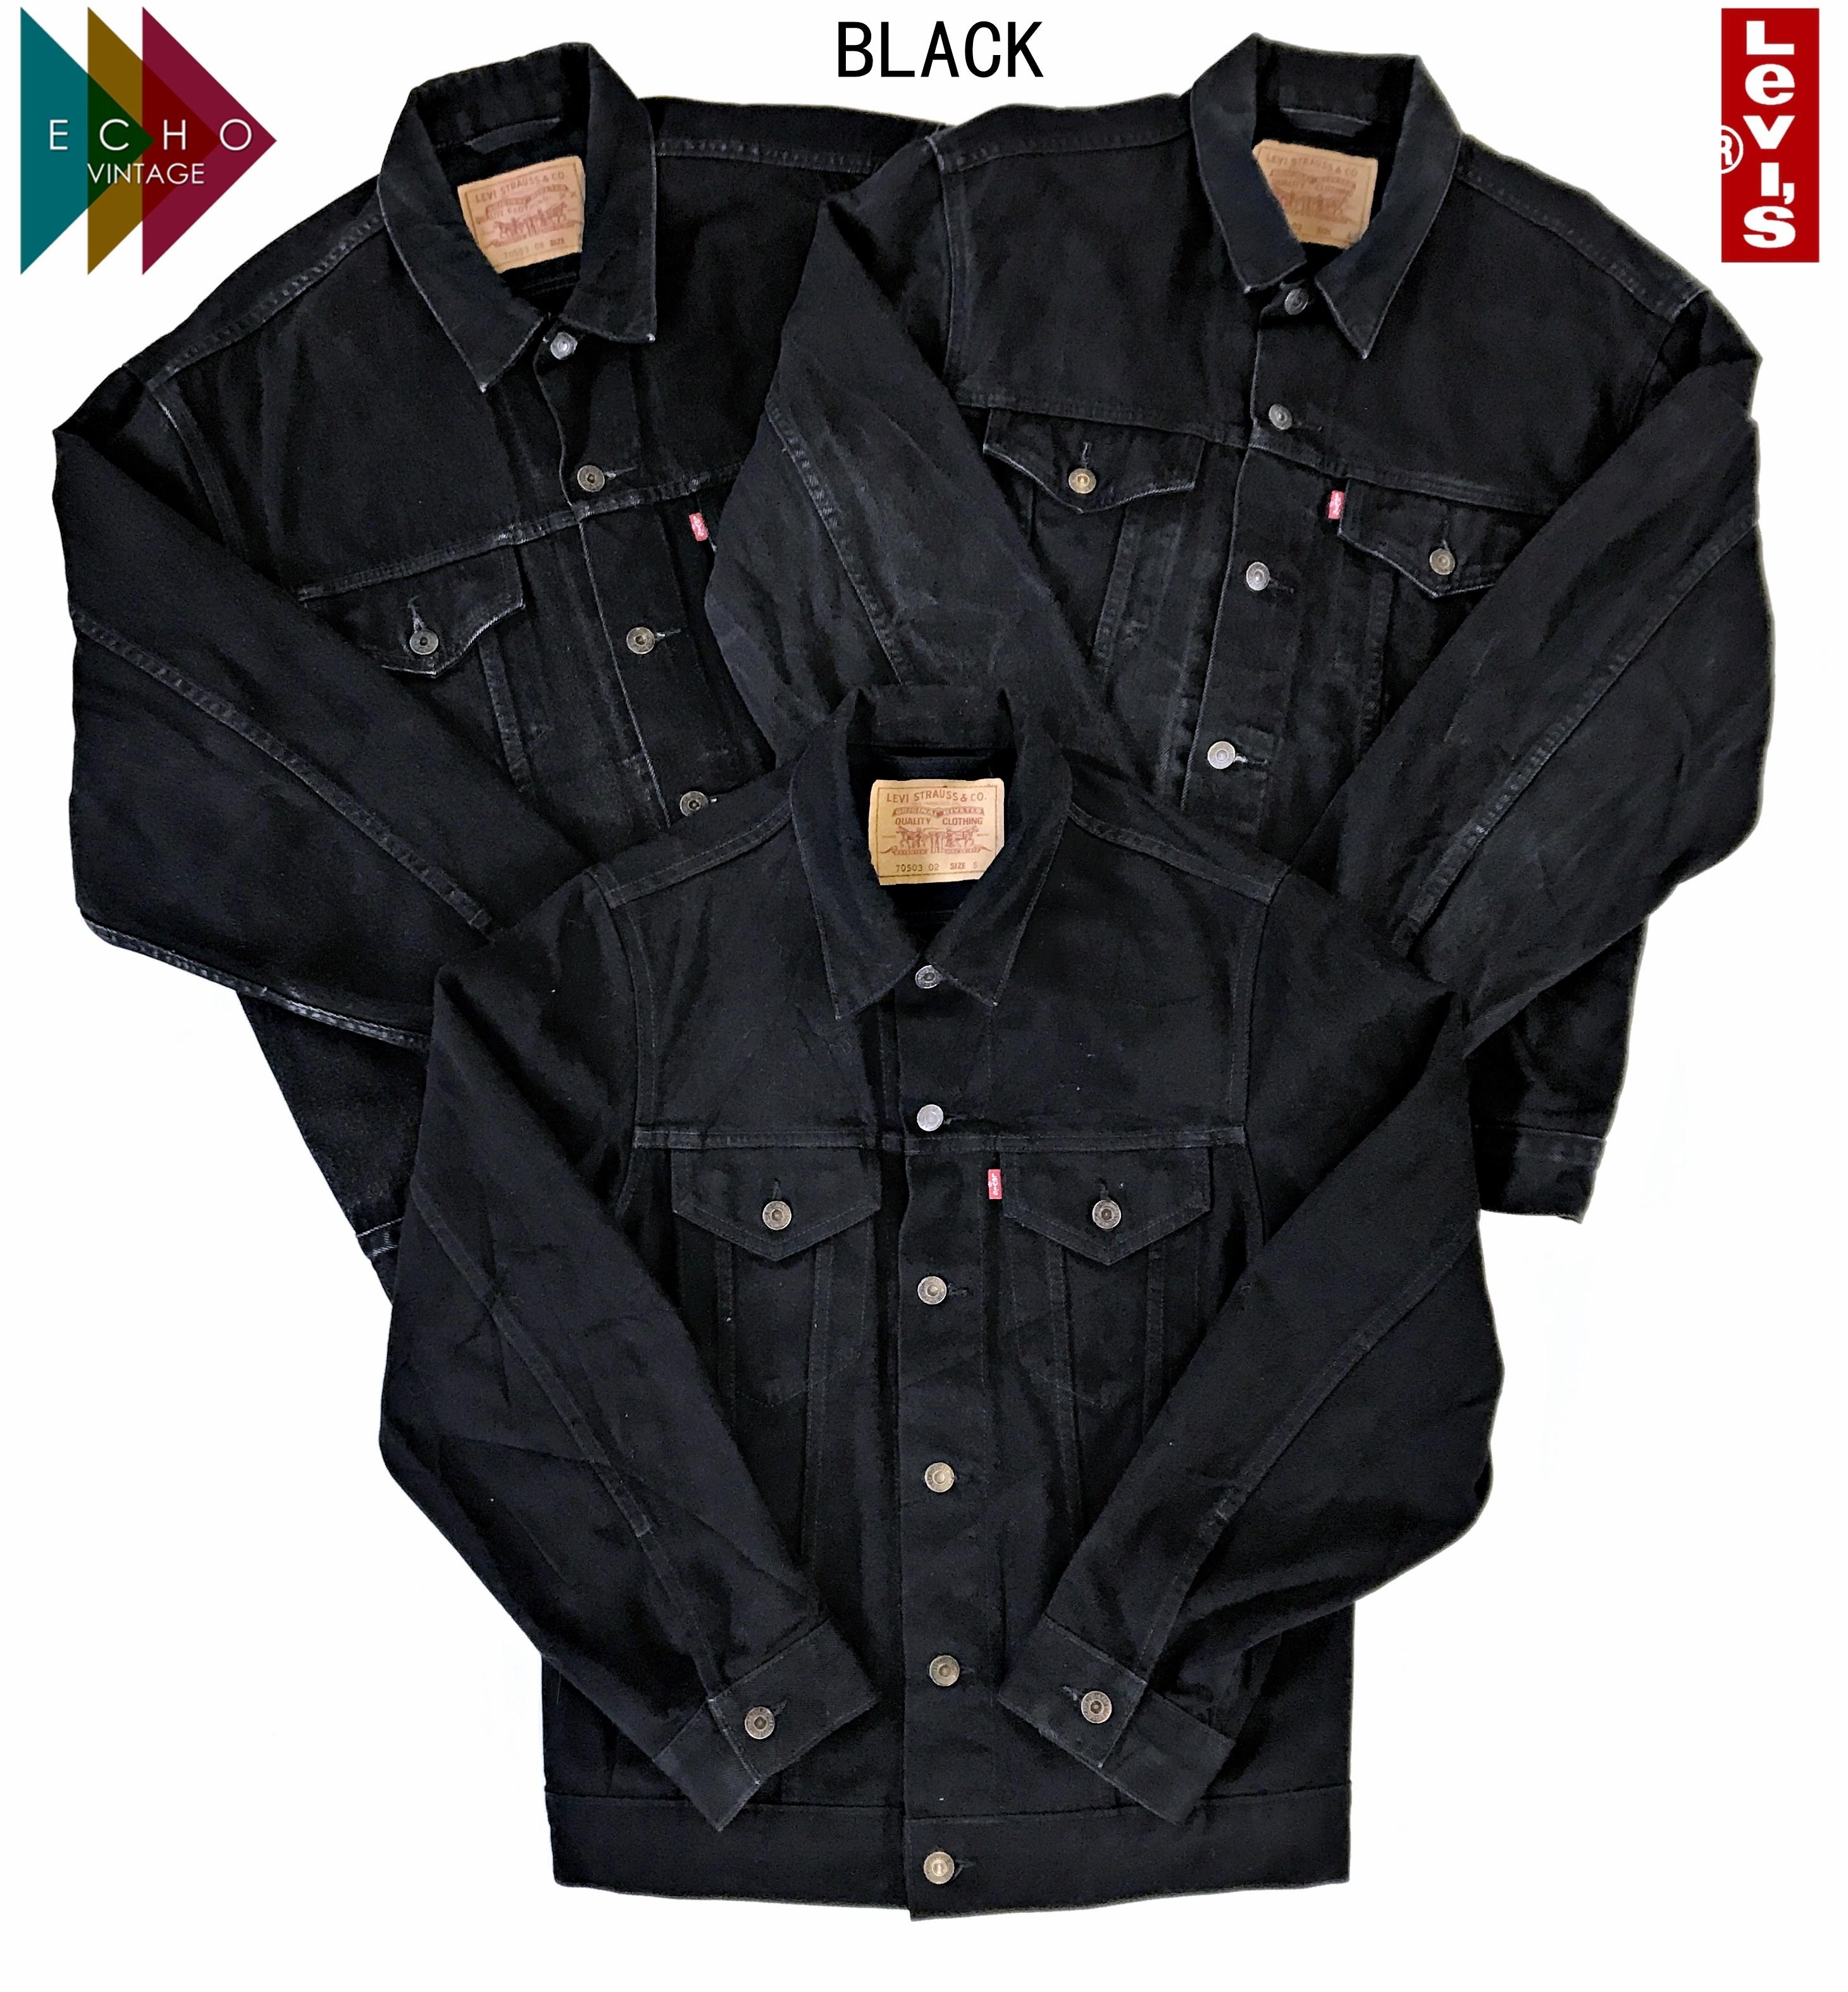 Vintage Levi Levis Denim Jacket Mens Womens Grade A Trucker Xs S M